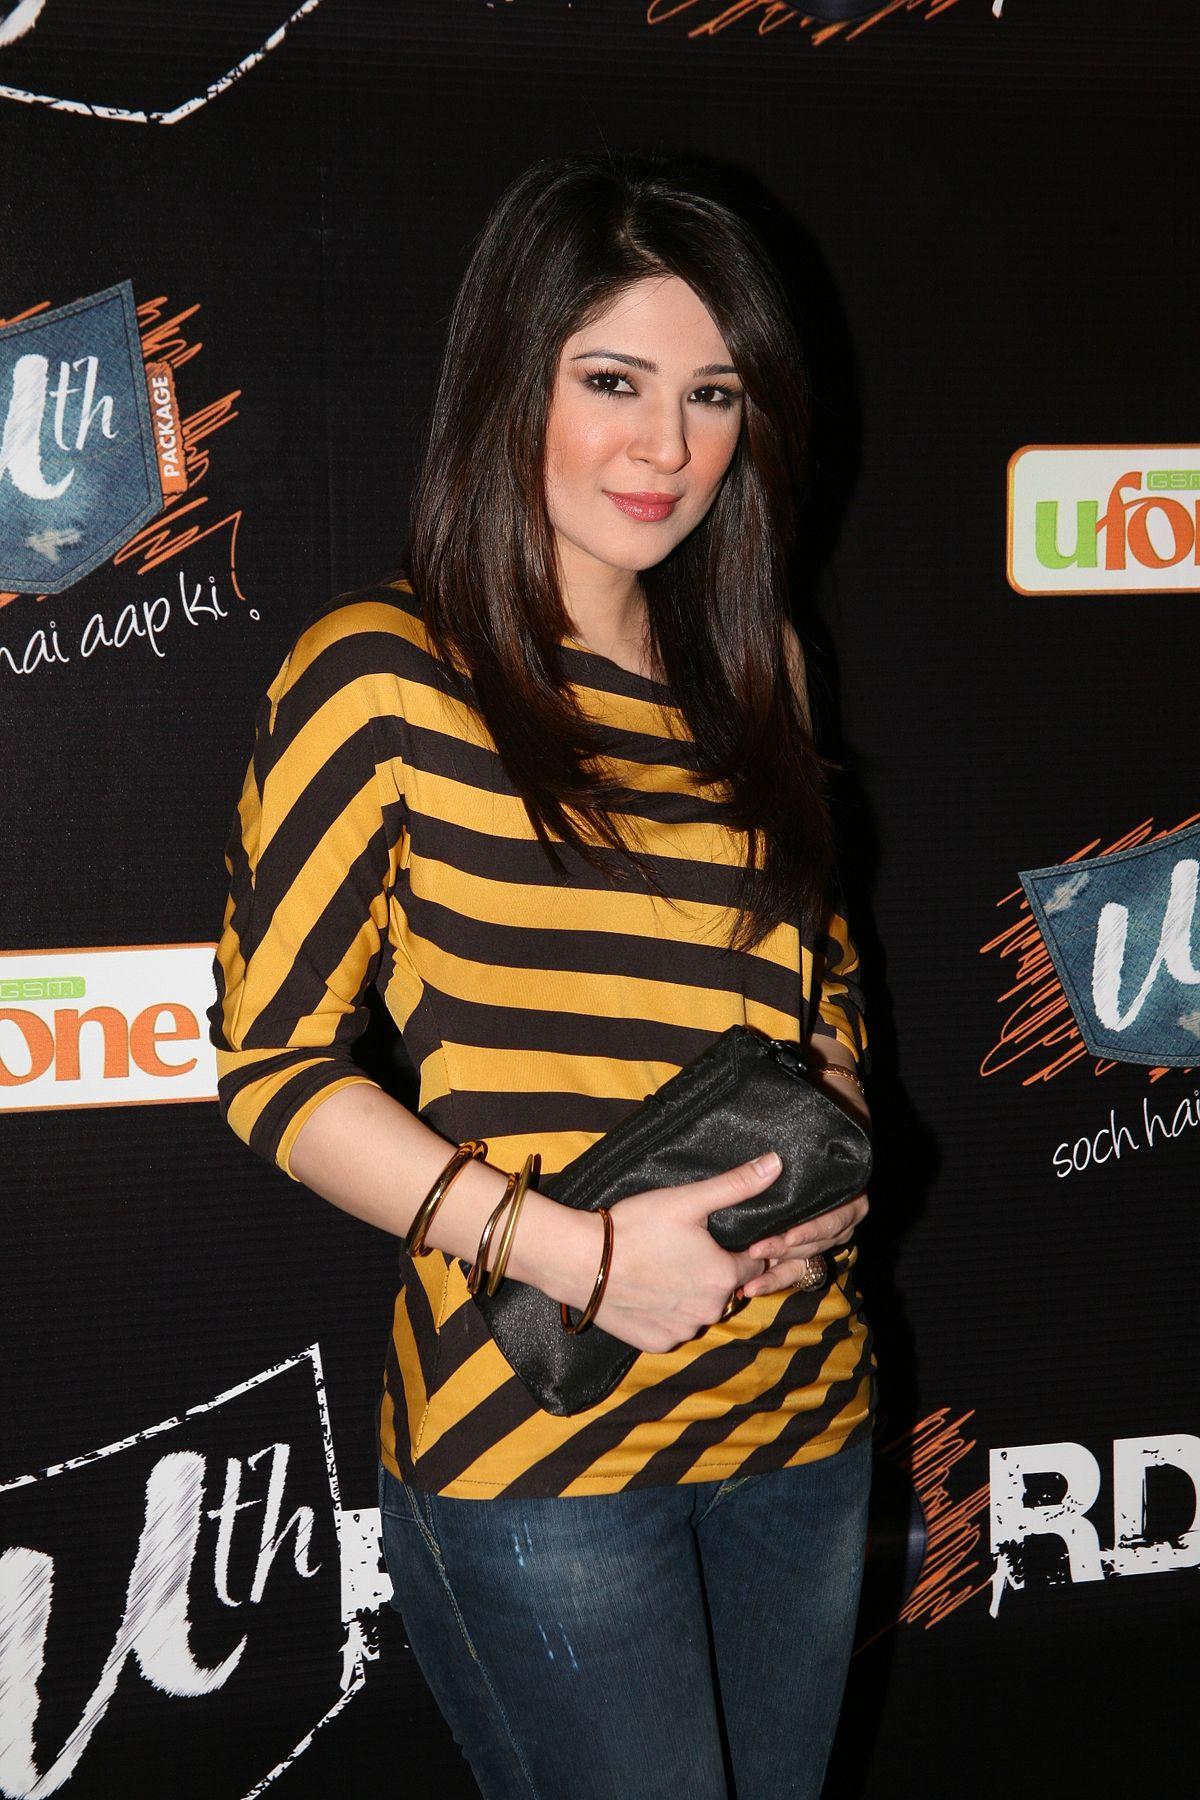 Ayesha Omer - Wikipedia